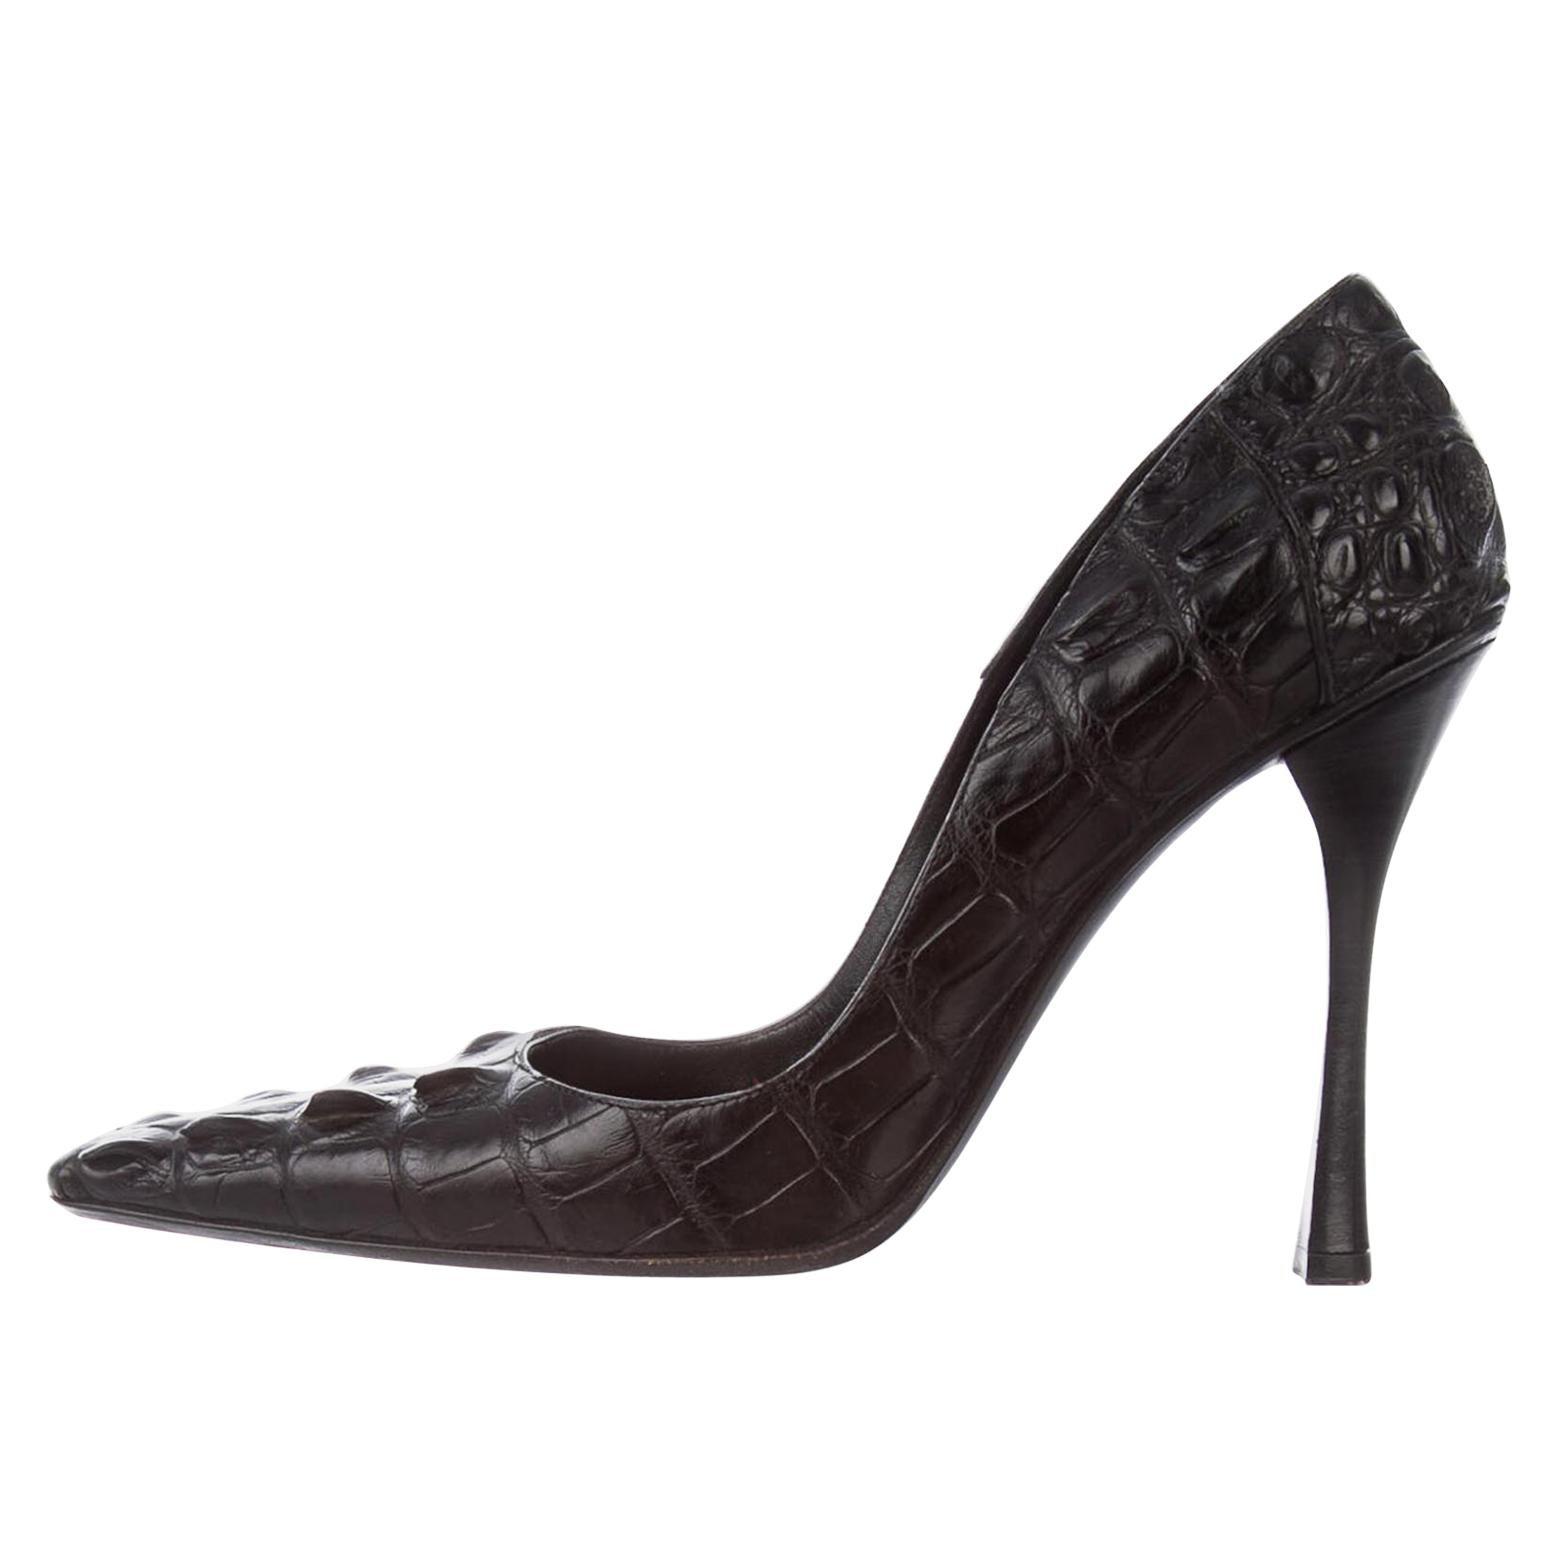 Tom Ford for Gucci F/W 2002 Black Crocodile Shoes Pumps 9 B